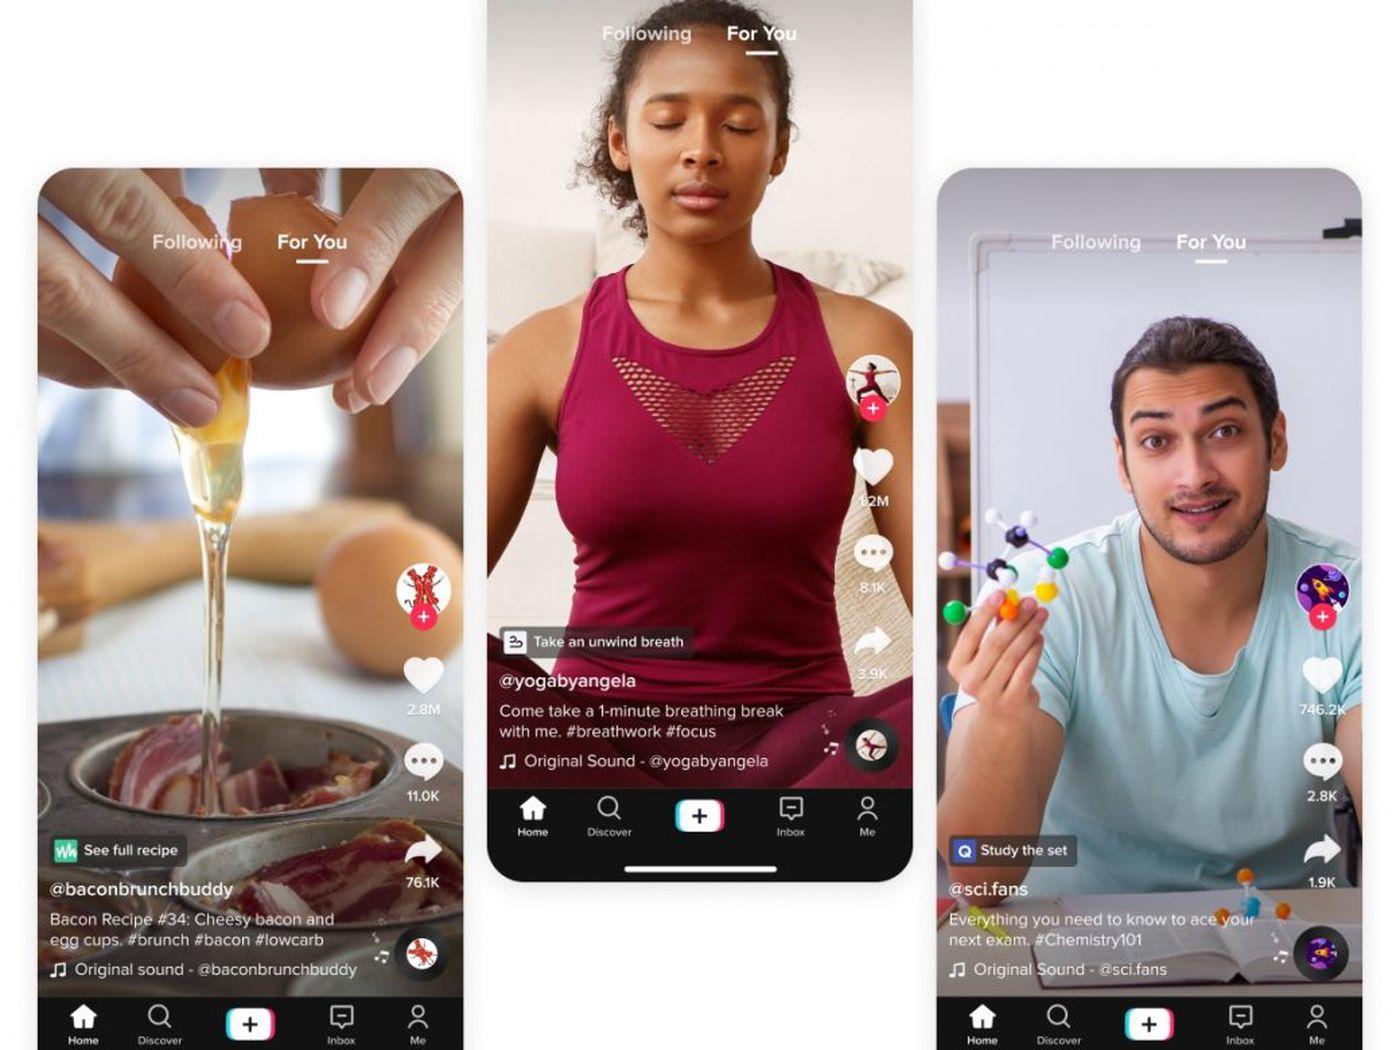 TikTok will let creators add mini apps to videos - The Verge